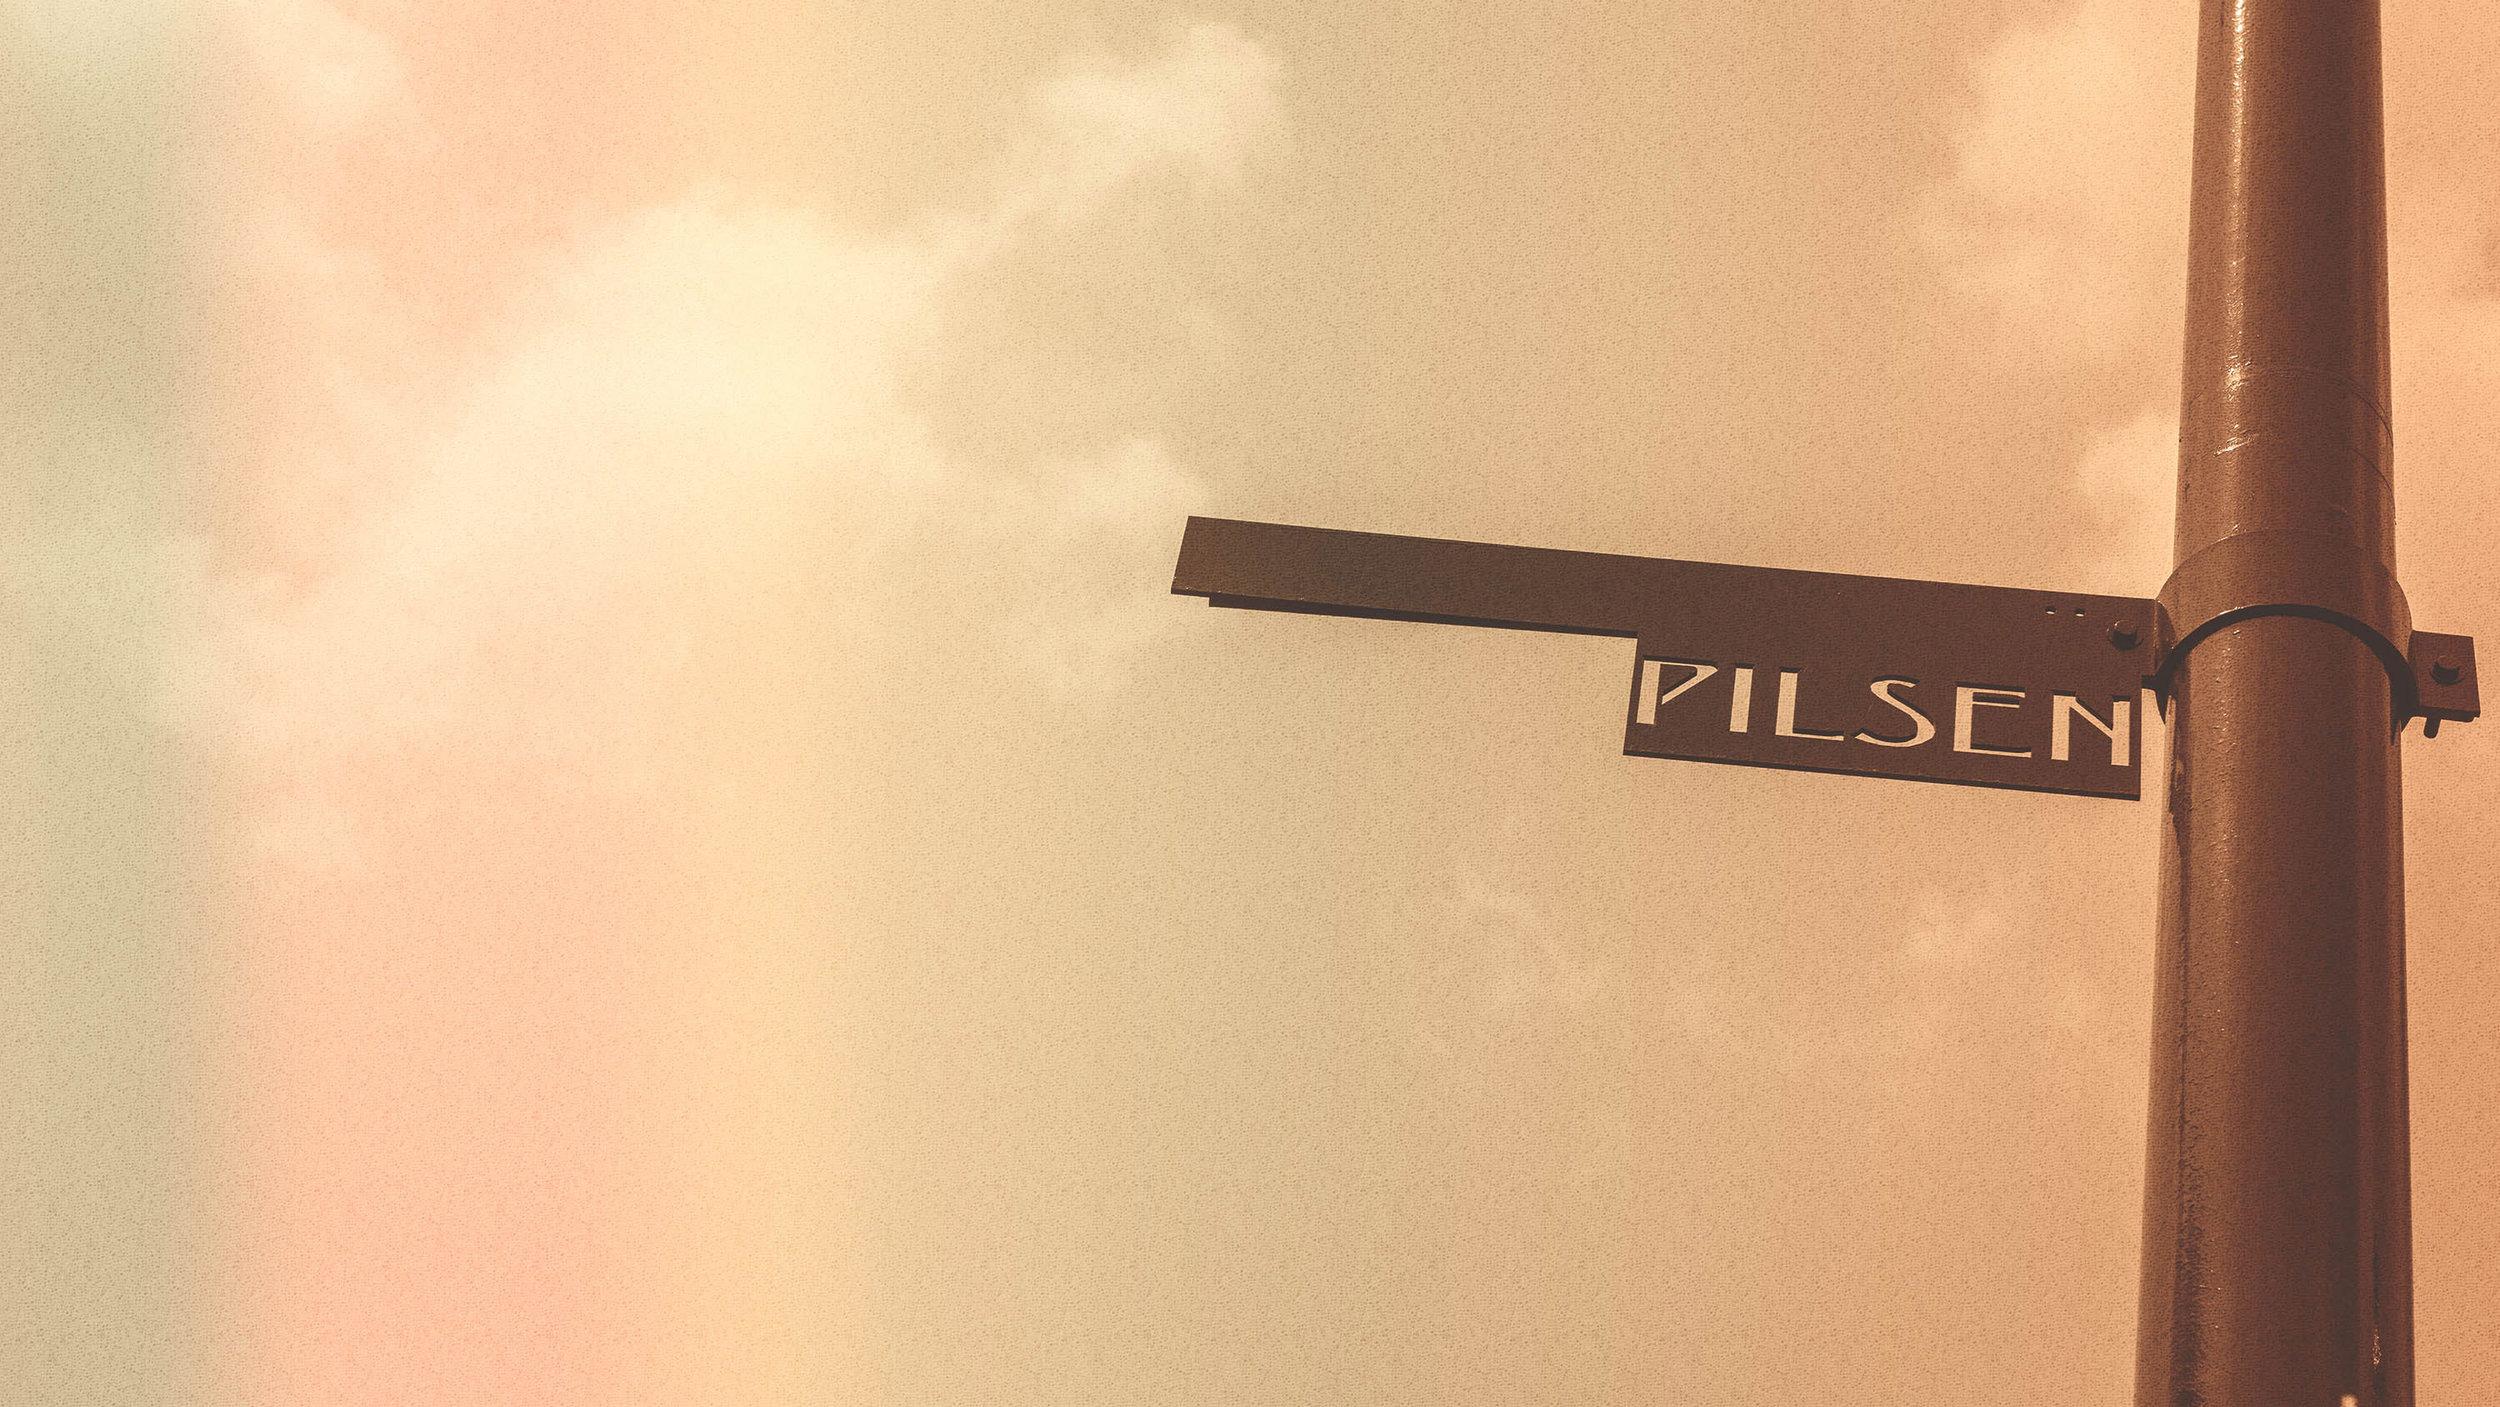 BRNDHAUS_PLSN_STREET_SIGN.jpg